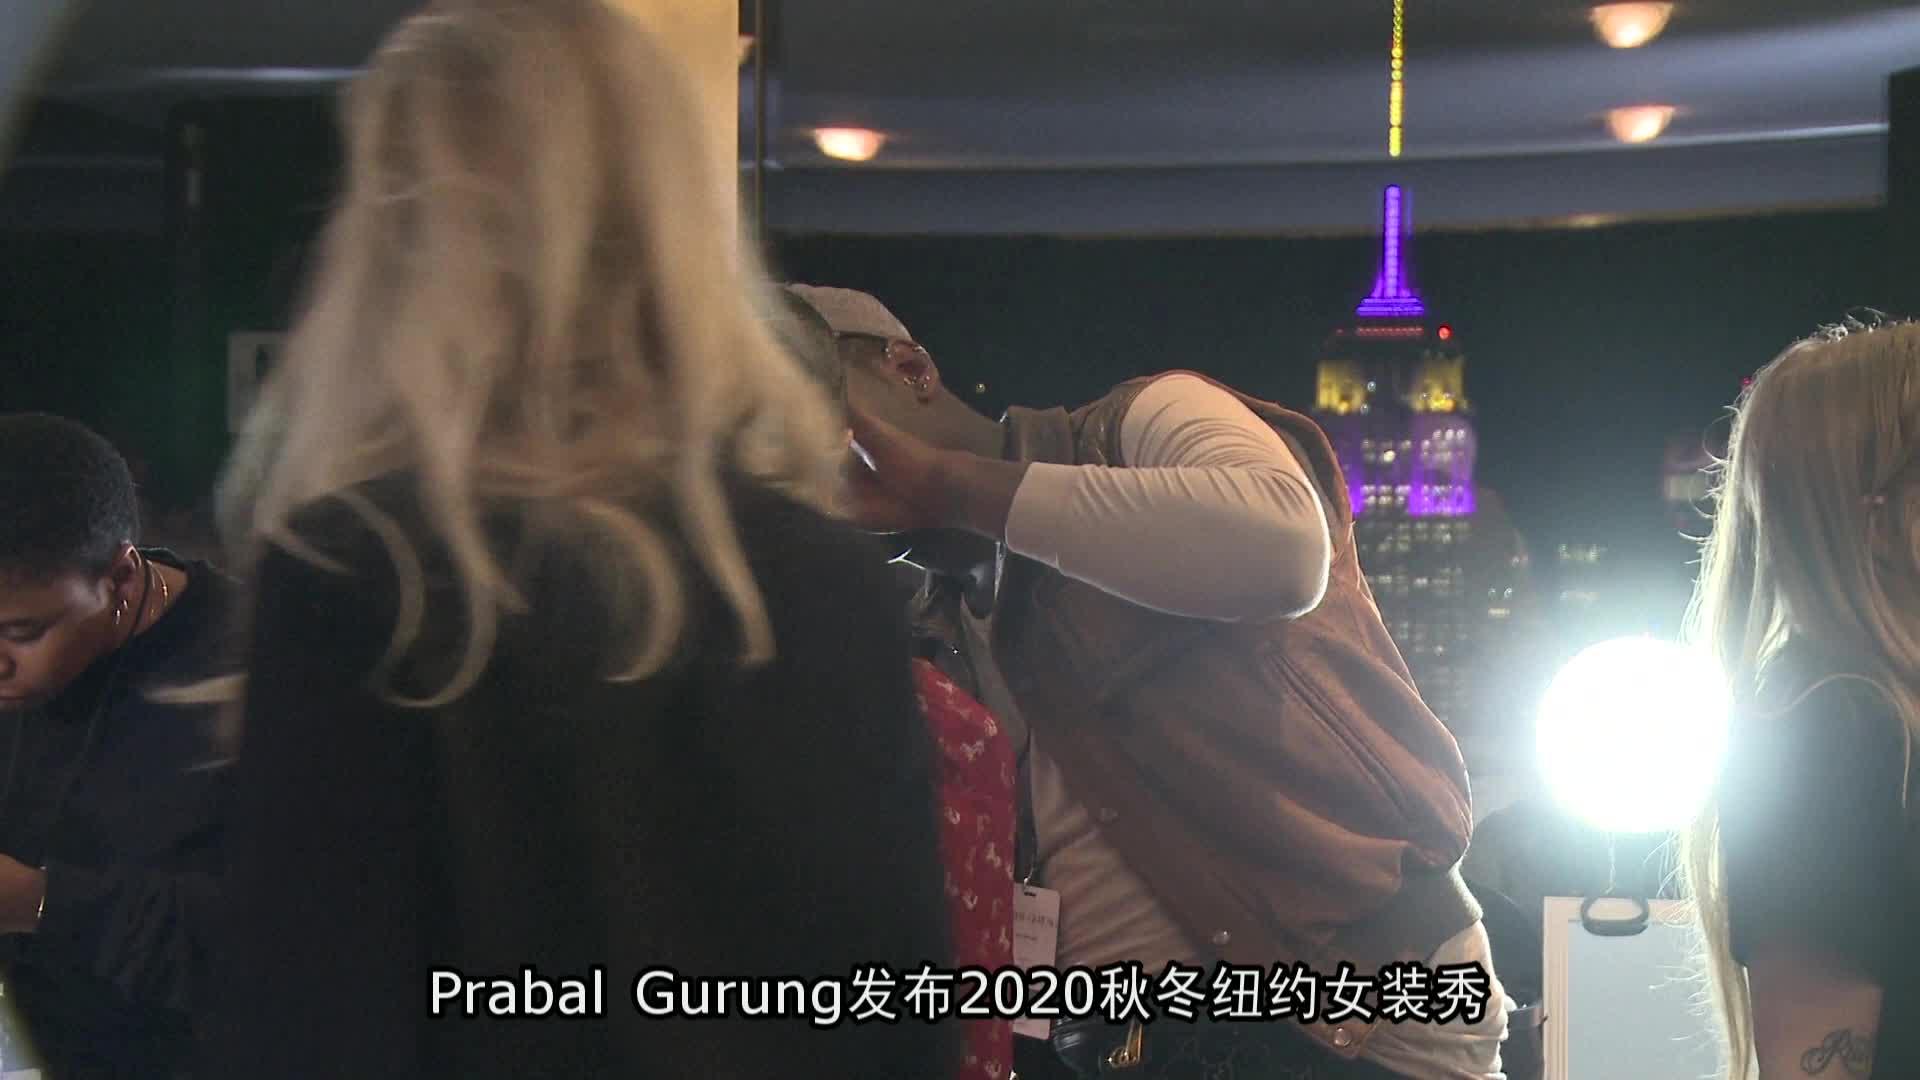 Prabal Gurung 2020秋冬纽约女装秀